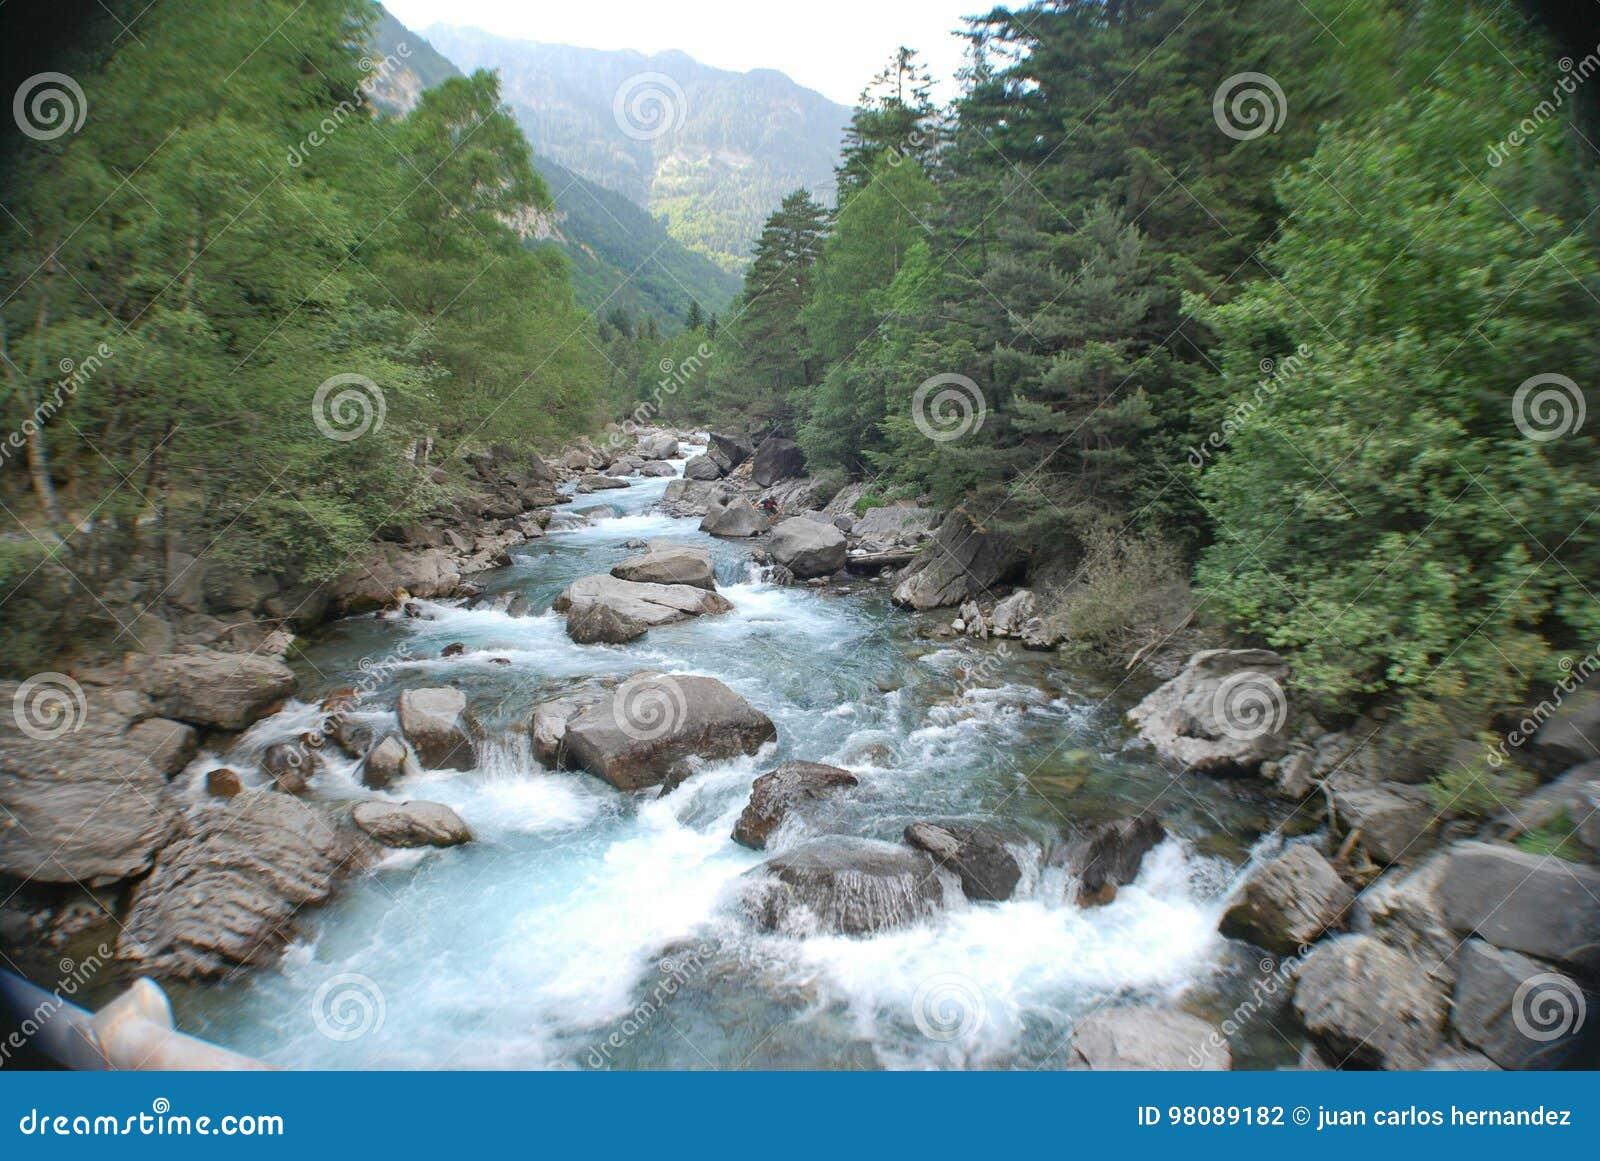 Река в долине bujaruelo